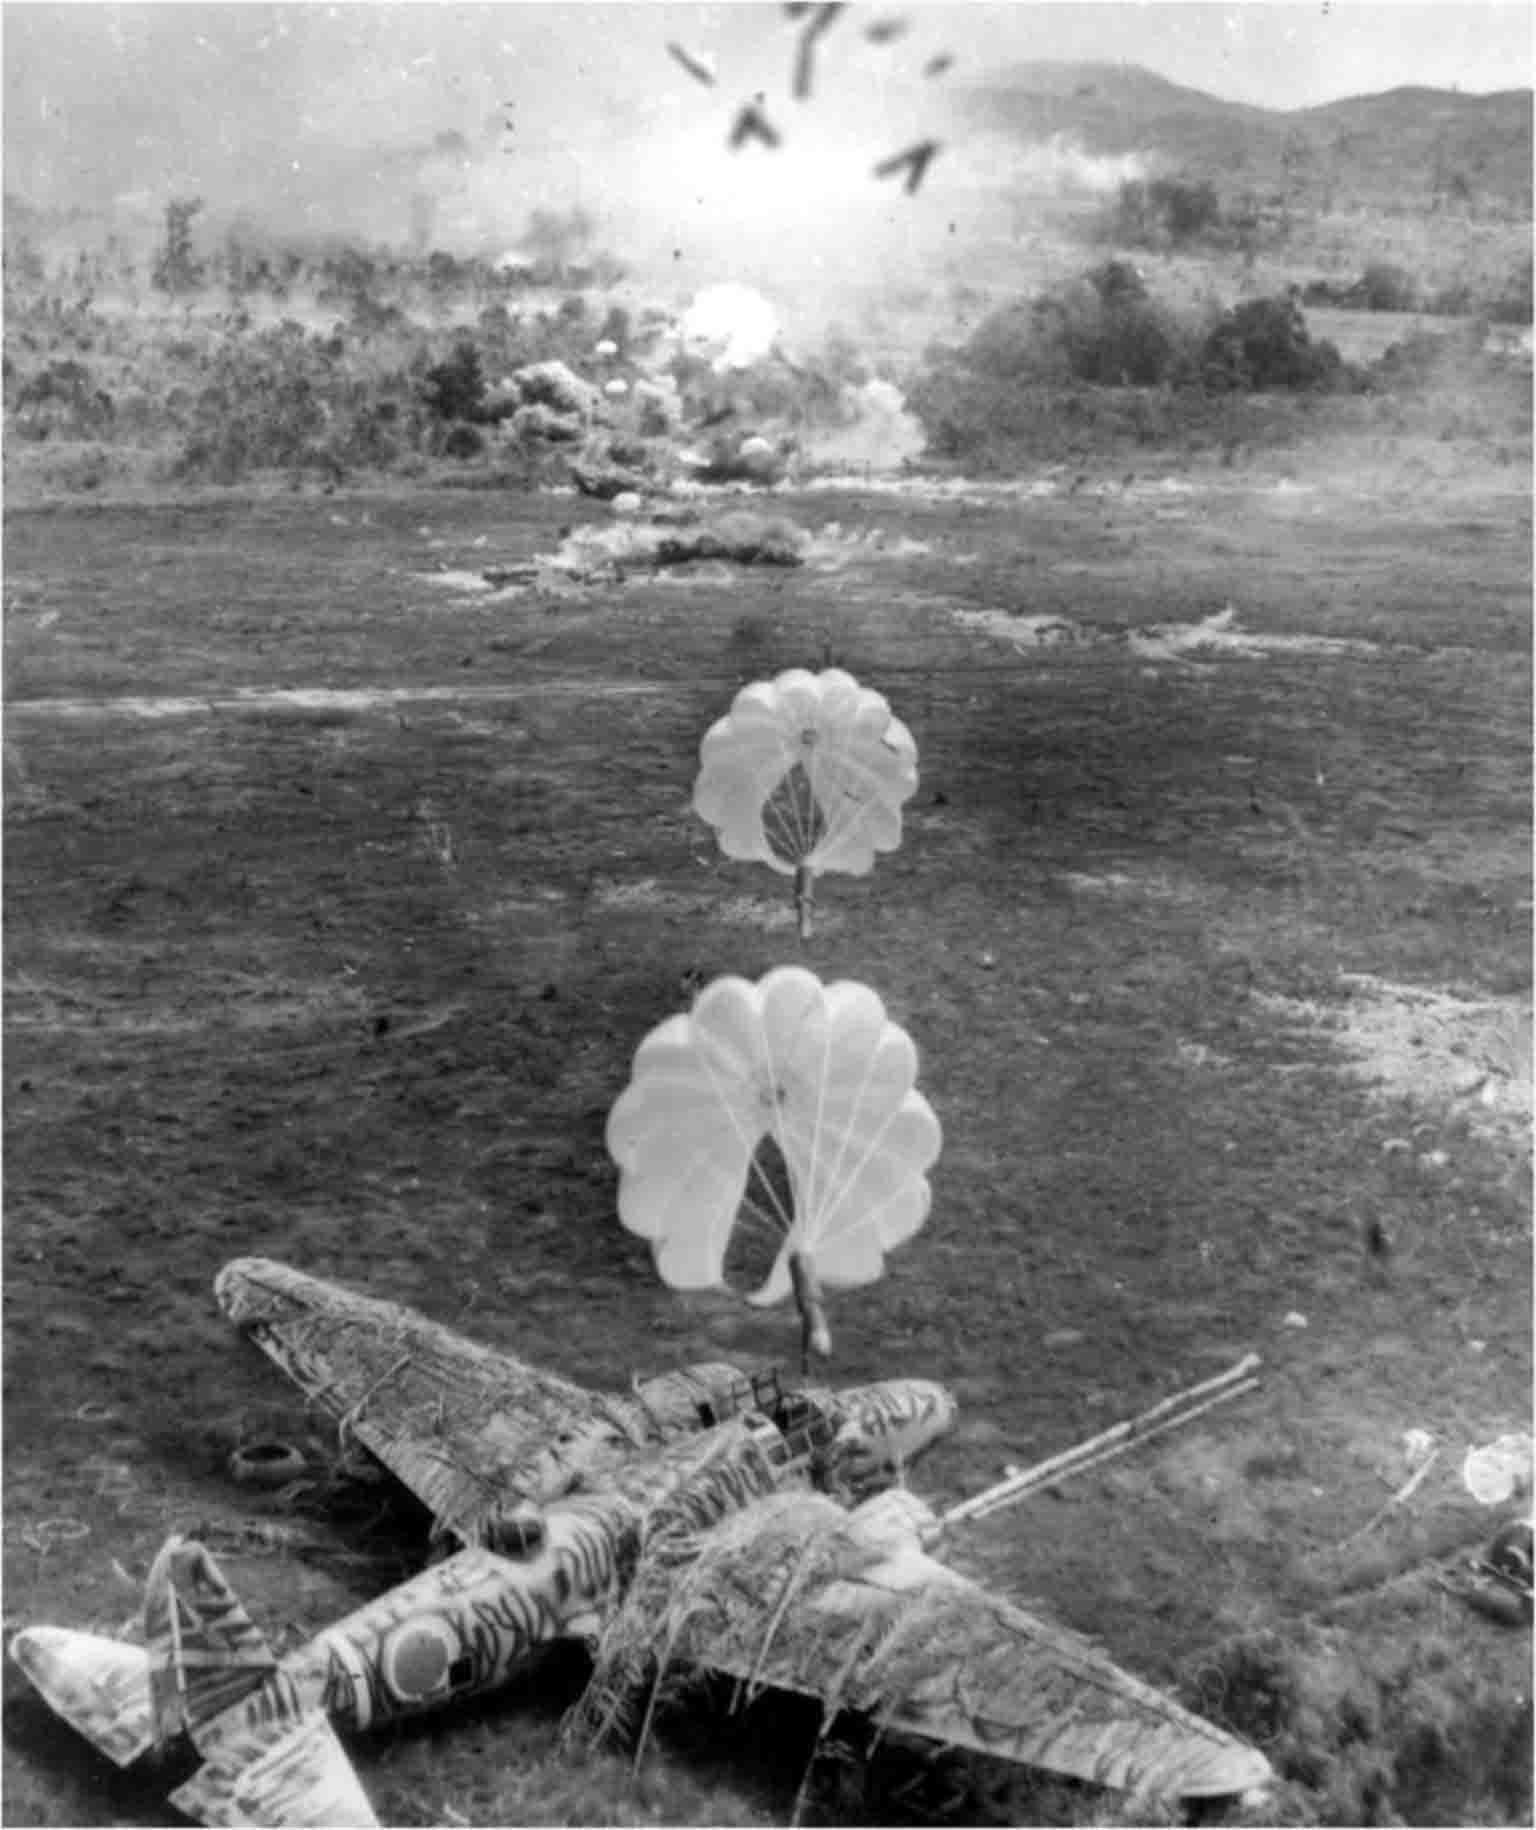 Parachute bombing